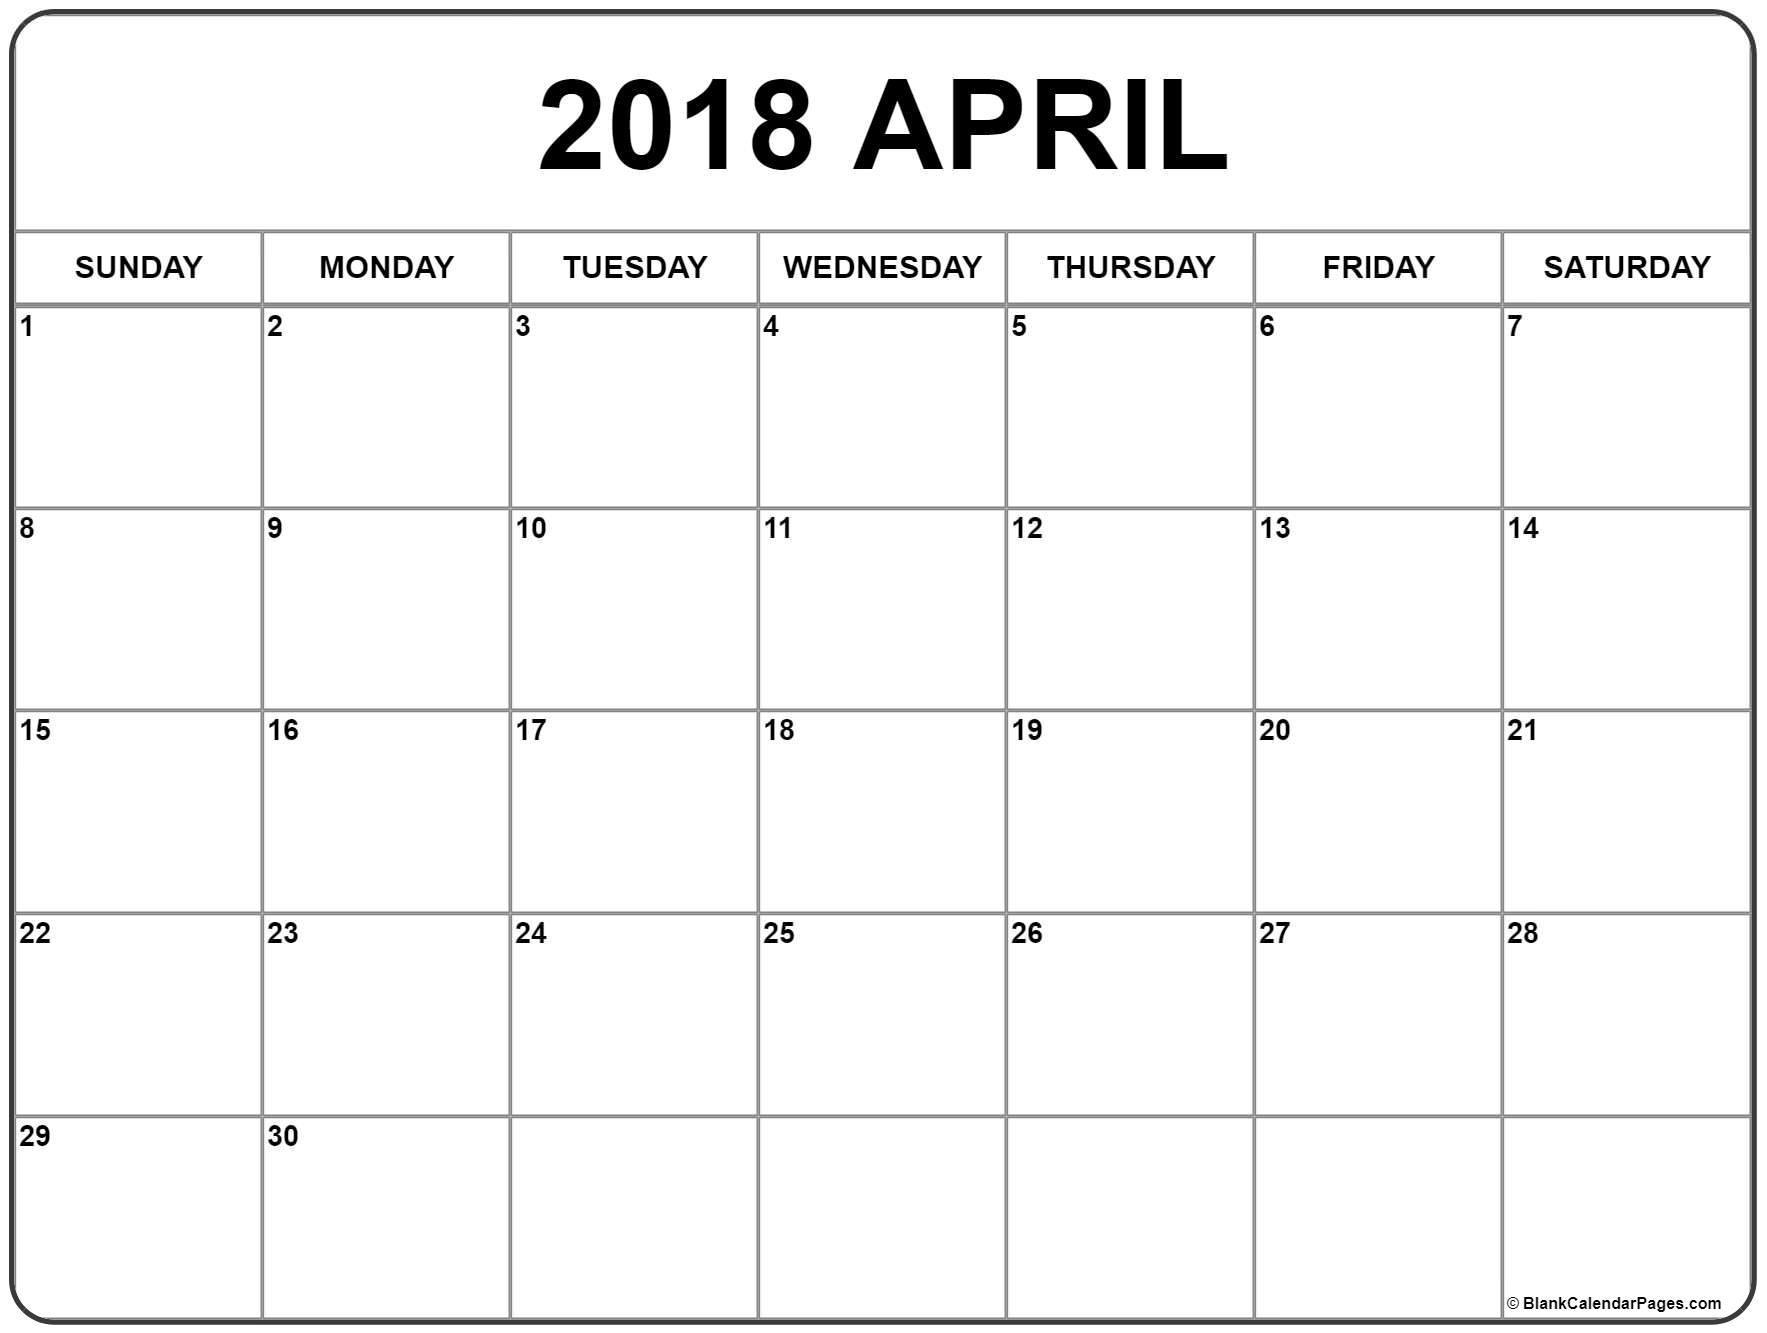 April 2018 Calendar | Free Printable Monthly Calendars